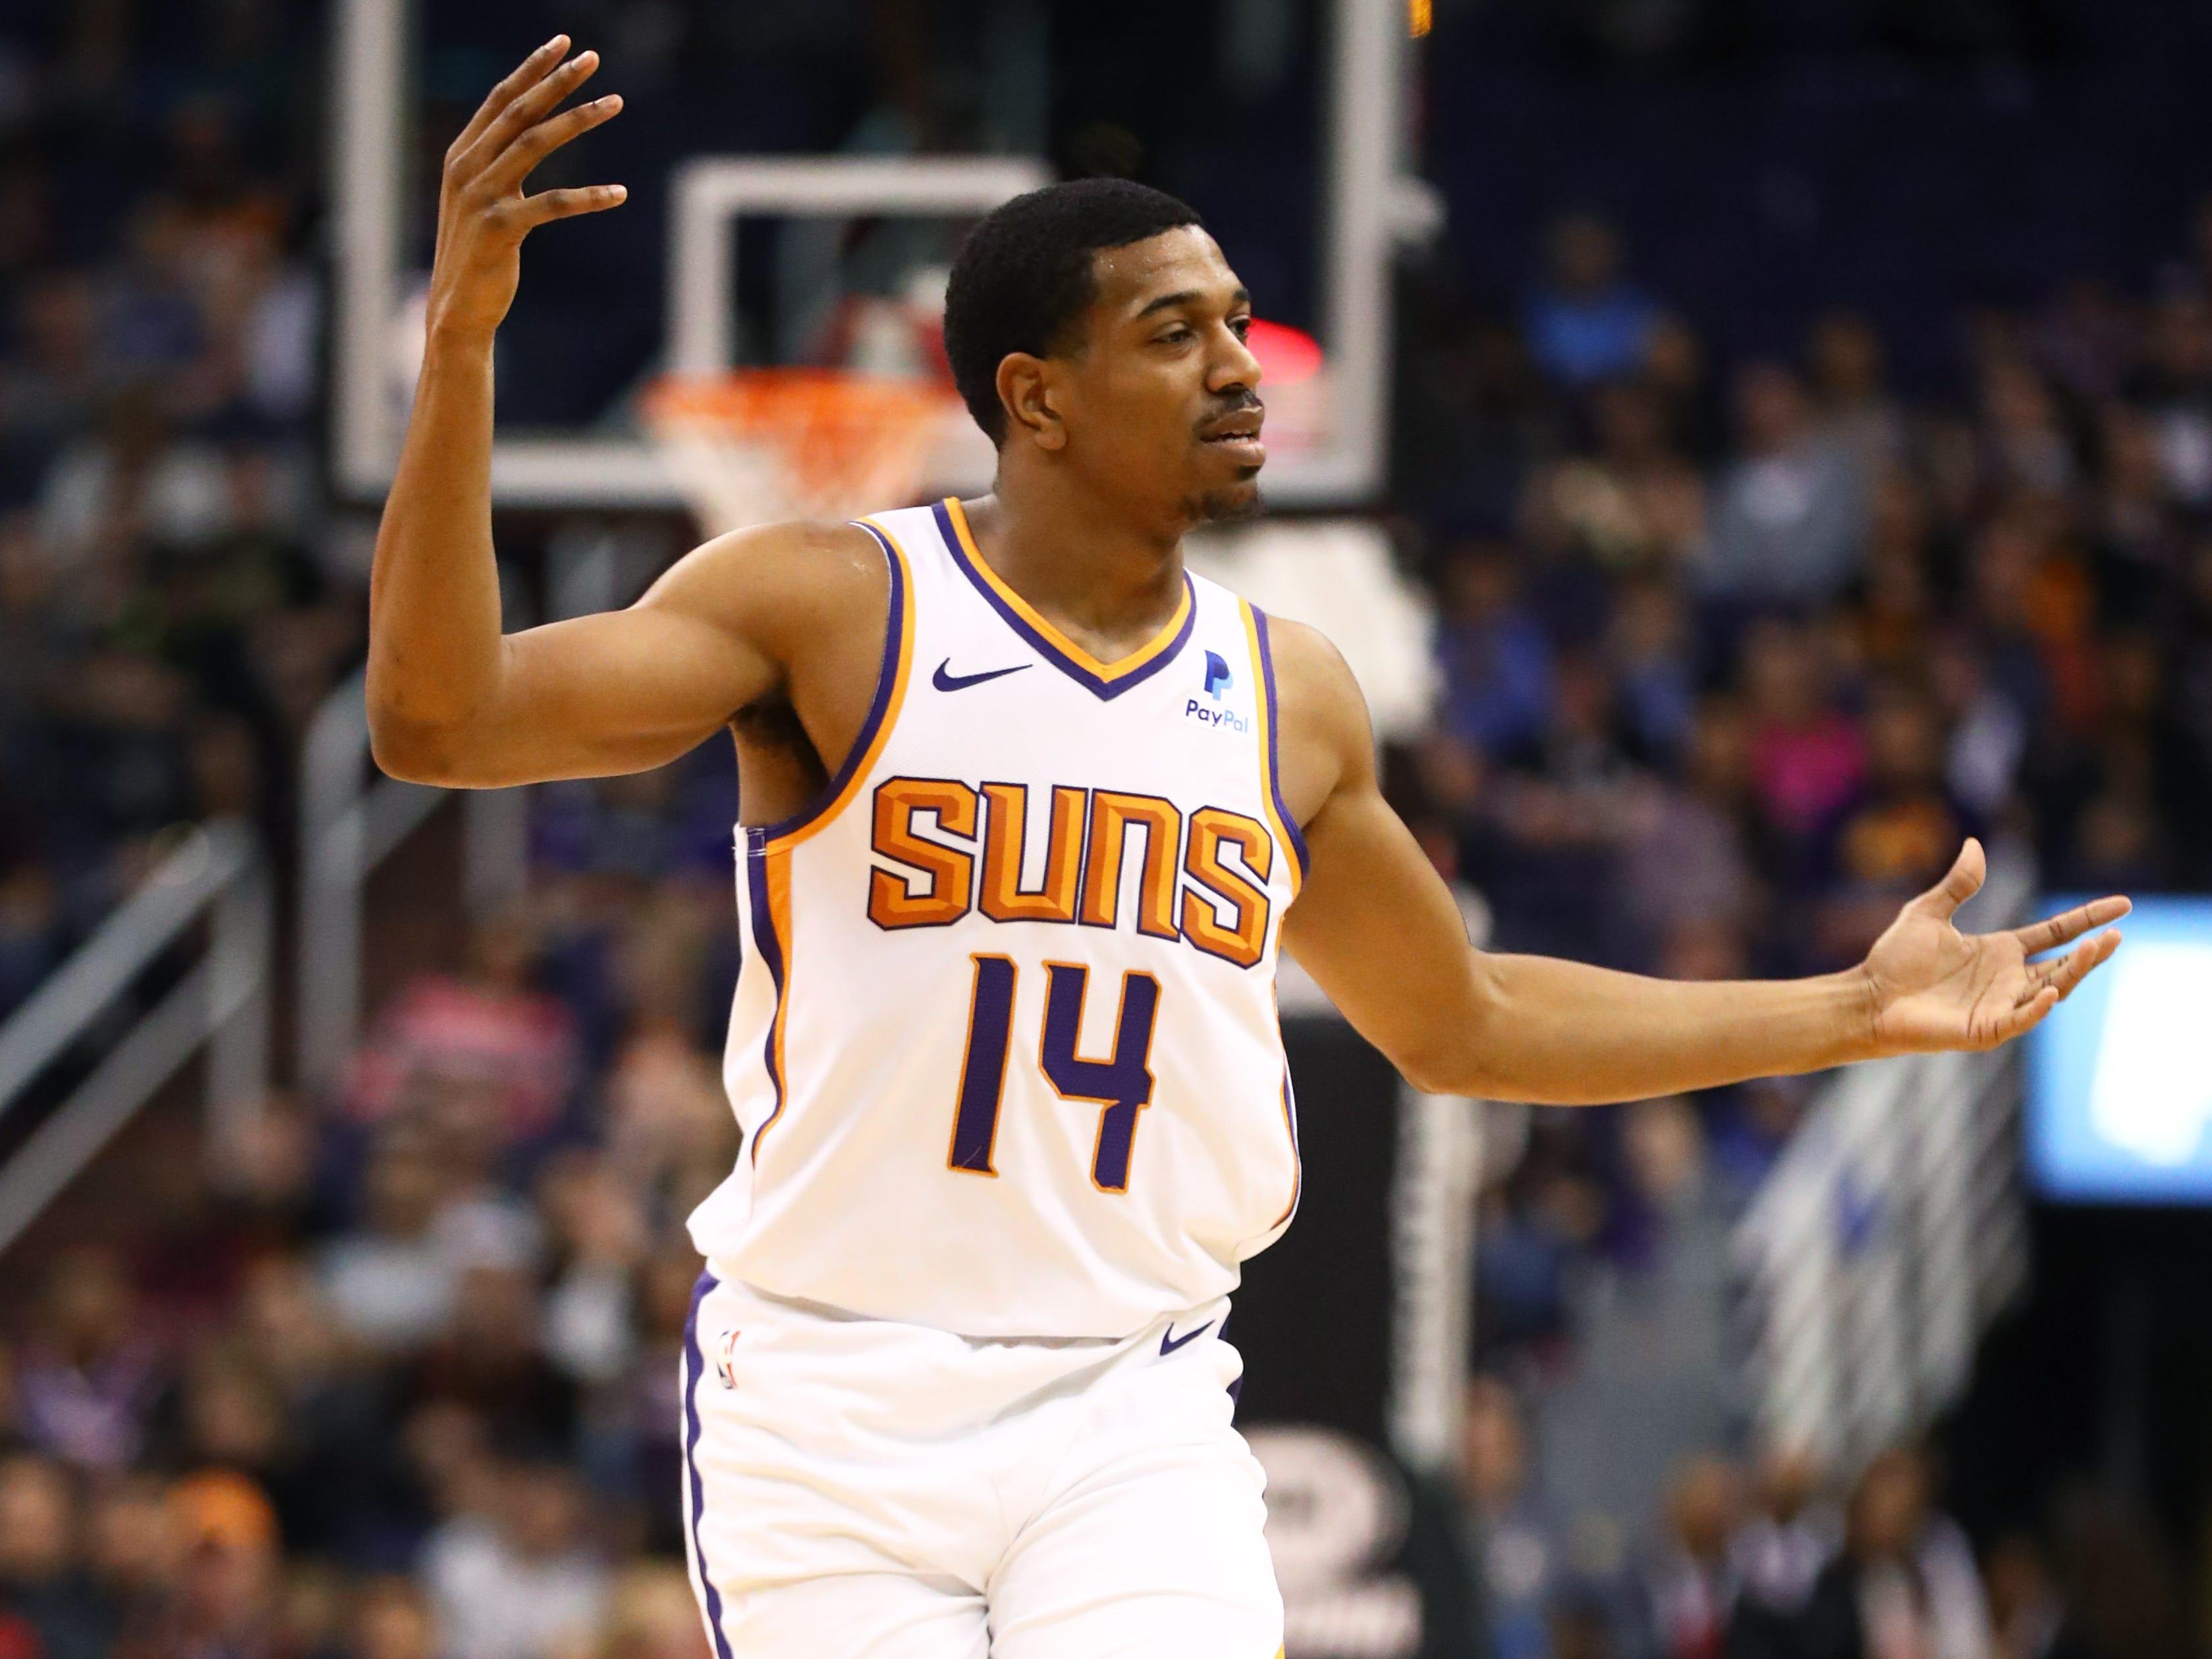 Jan 8, 2019; Phoenix, AZ, USA; Phoenix Suns guard De'Anthony Melton reacts in the first quarter against the Sacramento Kings at Talking Stick Resort Arena. Mandatory Credit: Mark J. Rebilas-USA TODAY Sports